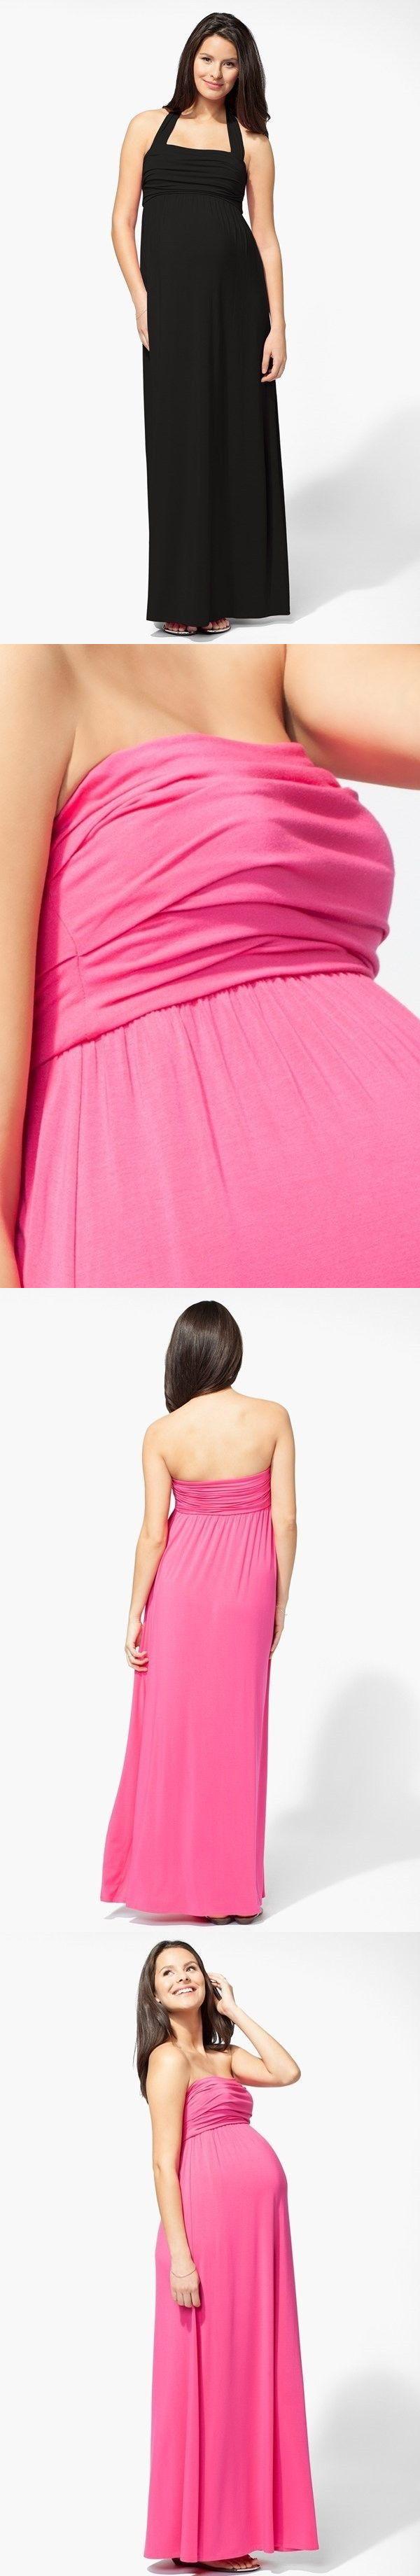 Dresses 11534 ingrid and isabel convertible maxi maternity dress dresses 11534 ingrid and isabel convertible maxi maternity dress black s 128 buy ombrellifo Images